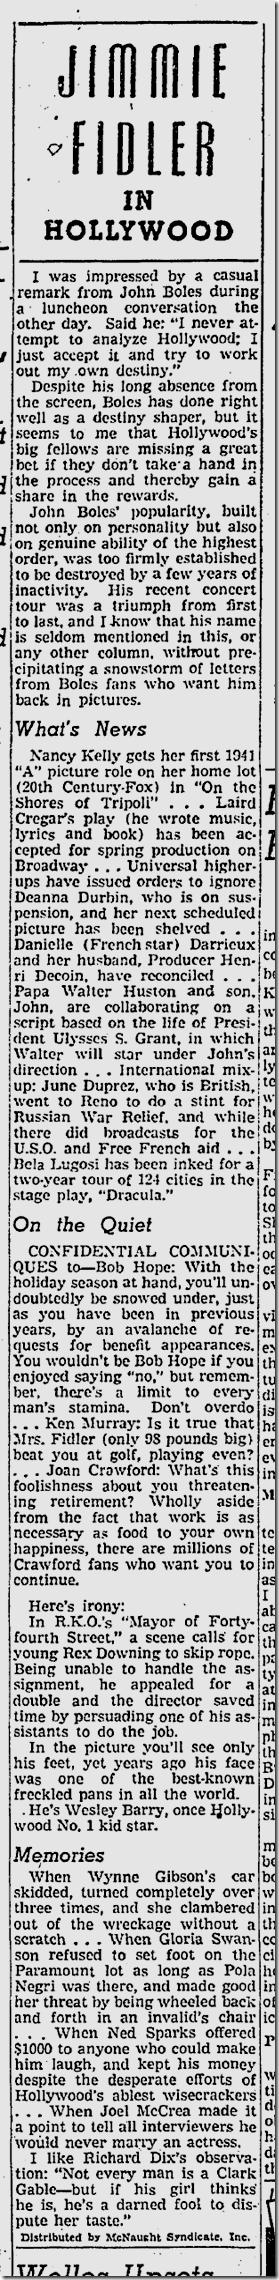 No. 21, 1941, Jimmie Fidler